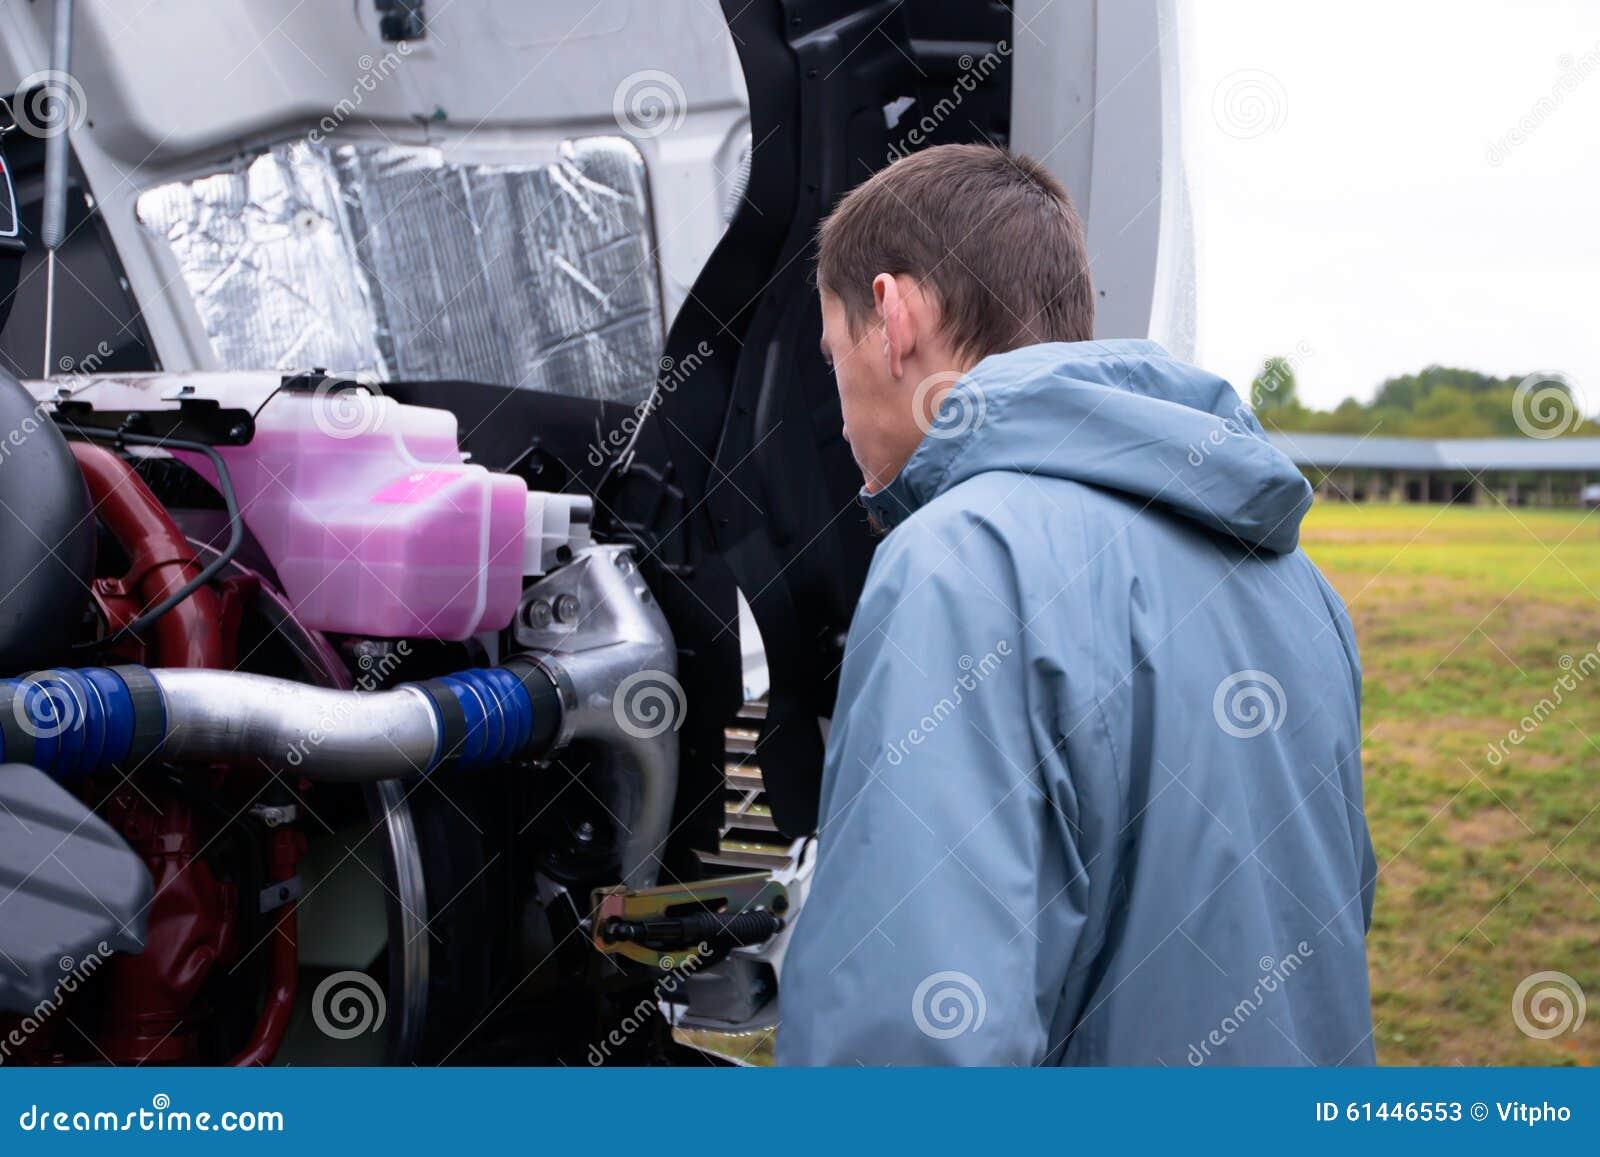 Long Haul Trucking >> Truck Driver Check Semi Truck Engine Before Driving Semi Truck Stock Photo - Image: 61446553